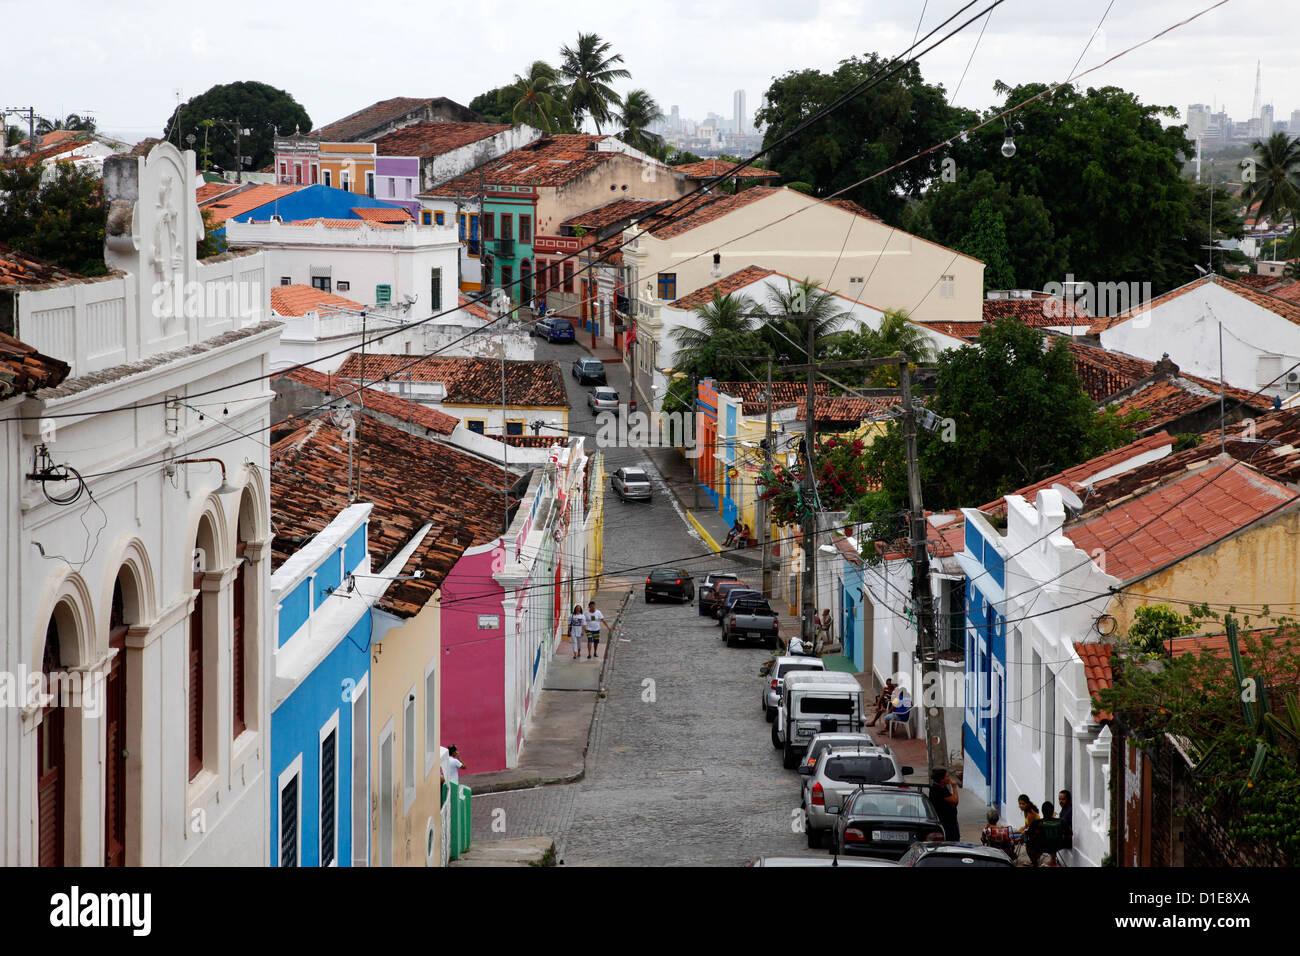 Straßenszene mit bunten Häusern, UNESCO-Weltkulturerbe, Olinda, Pernambuco, Brasilien, Südamerika Stockbild